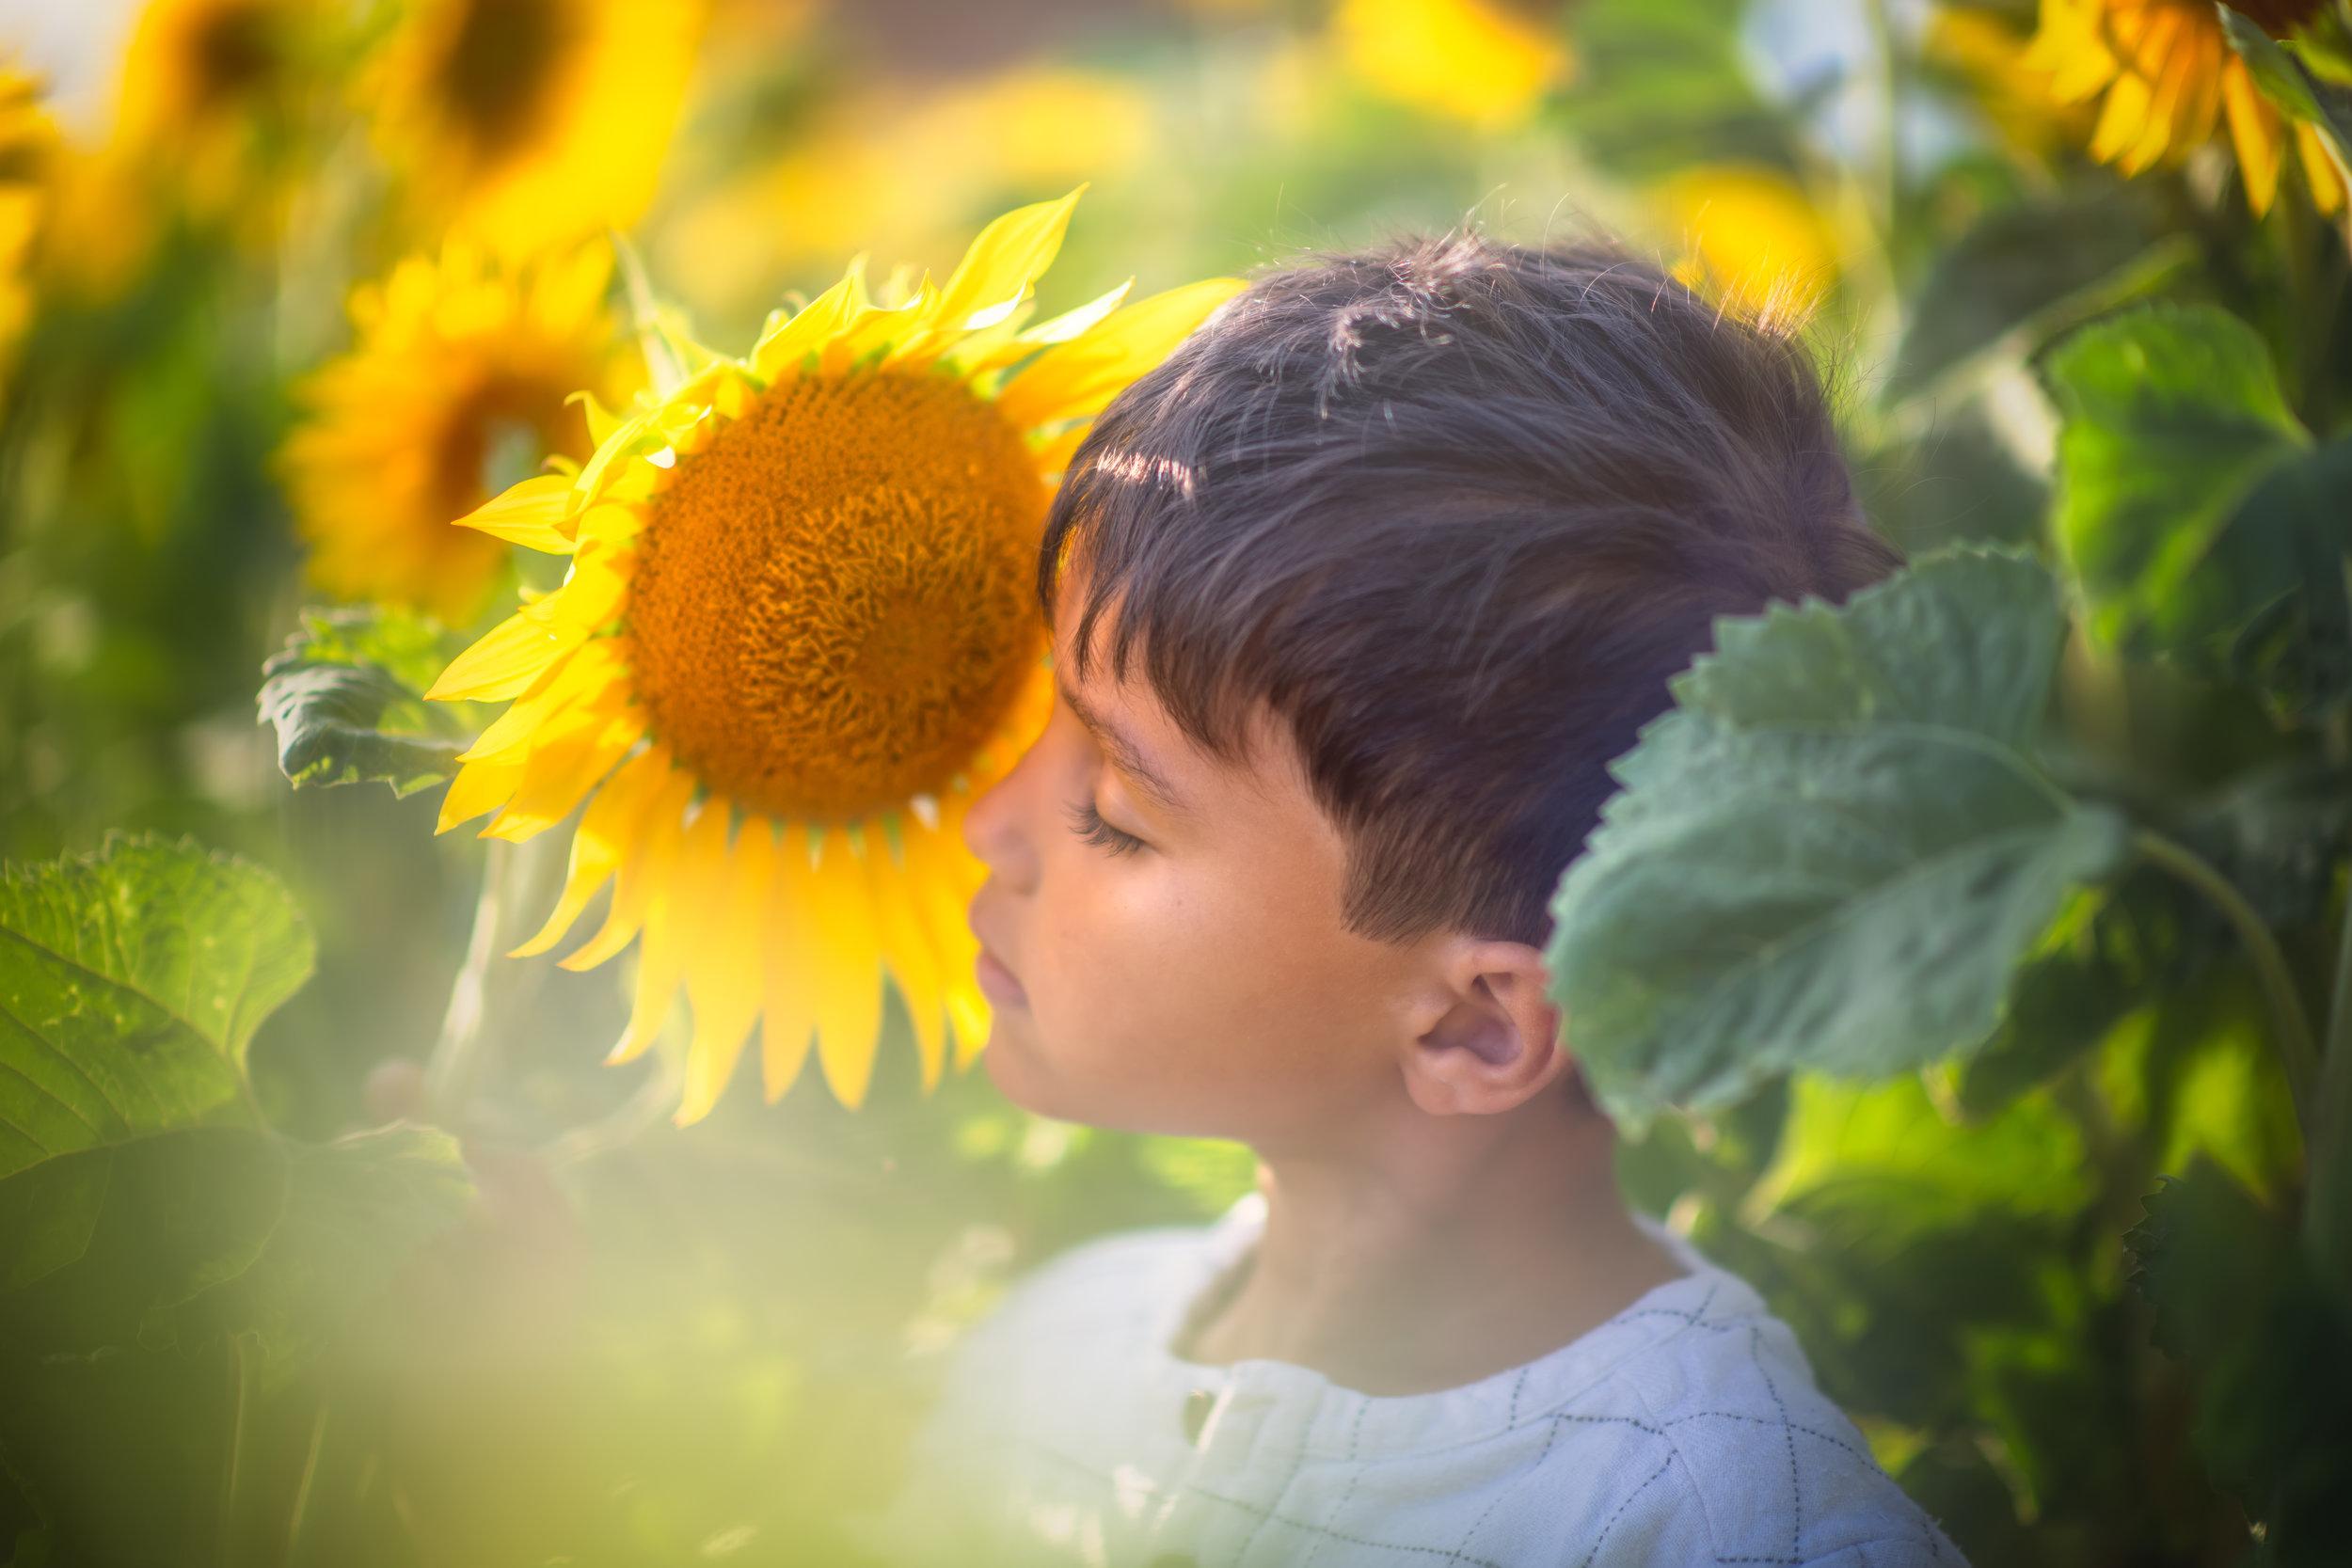 writtle_sunflower.jpg